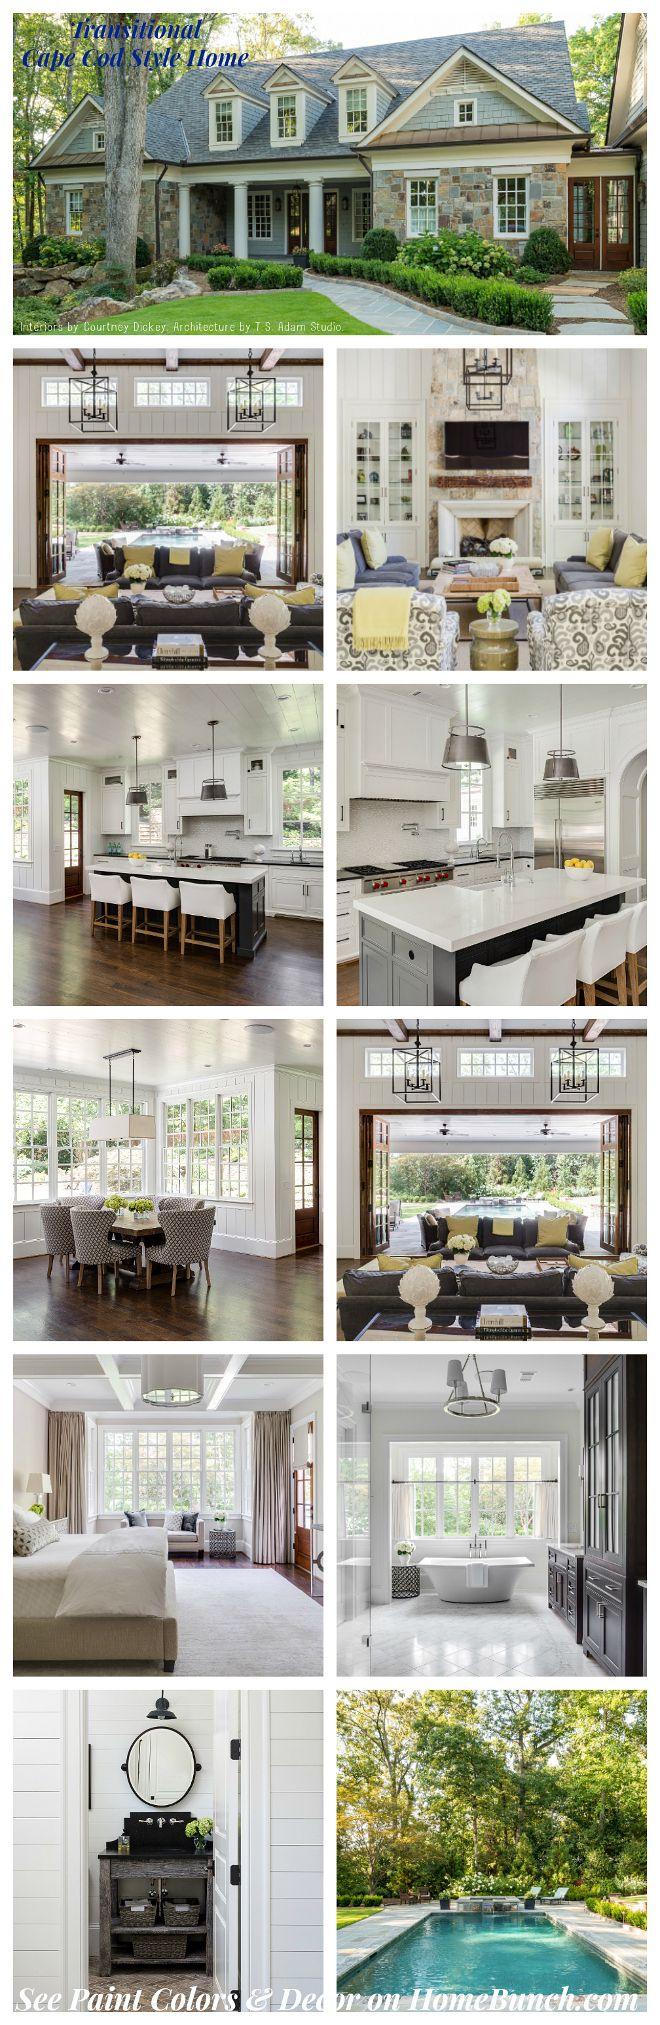 best of cape cod interior decorating ideas home design pictures